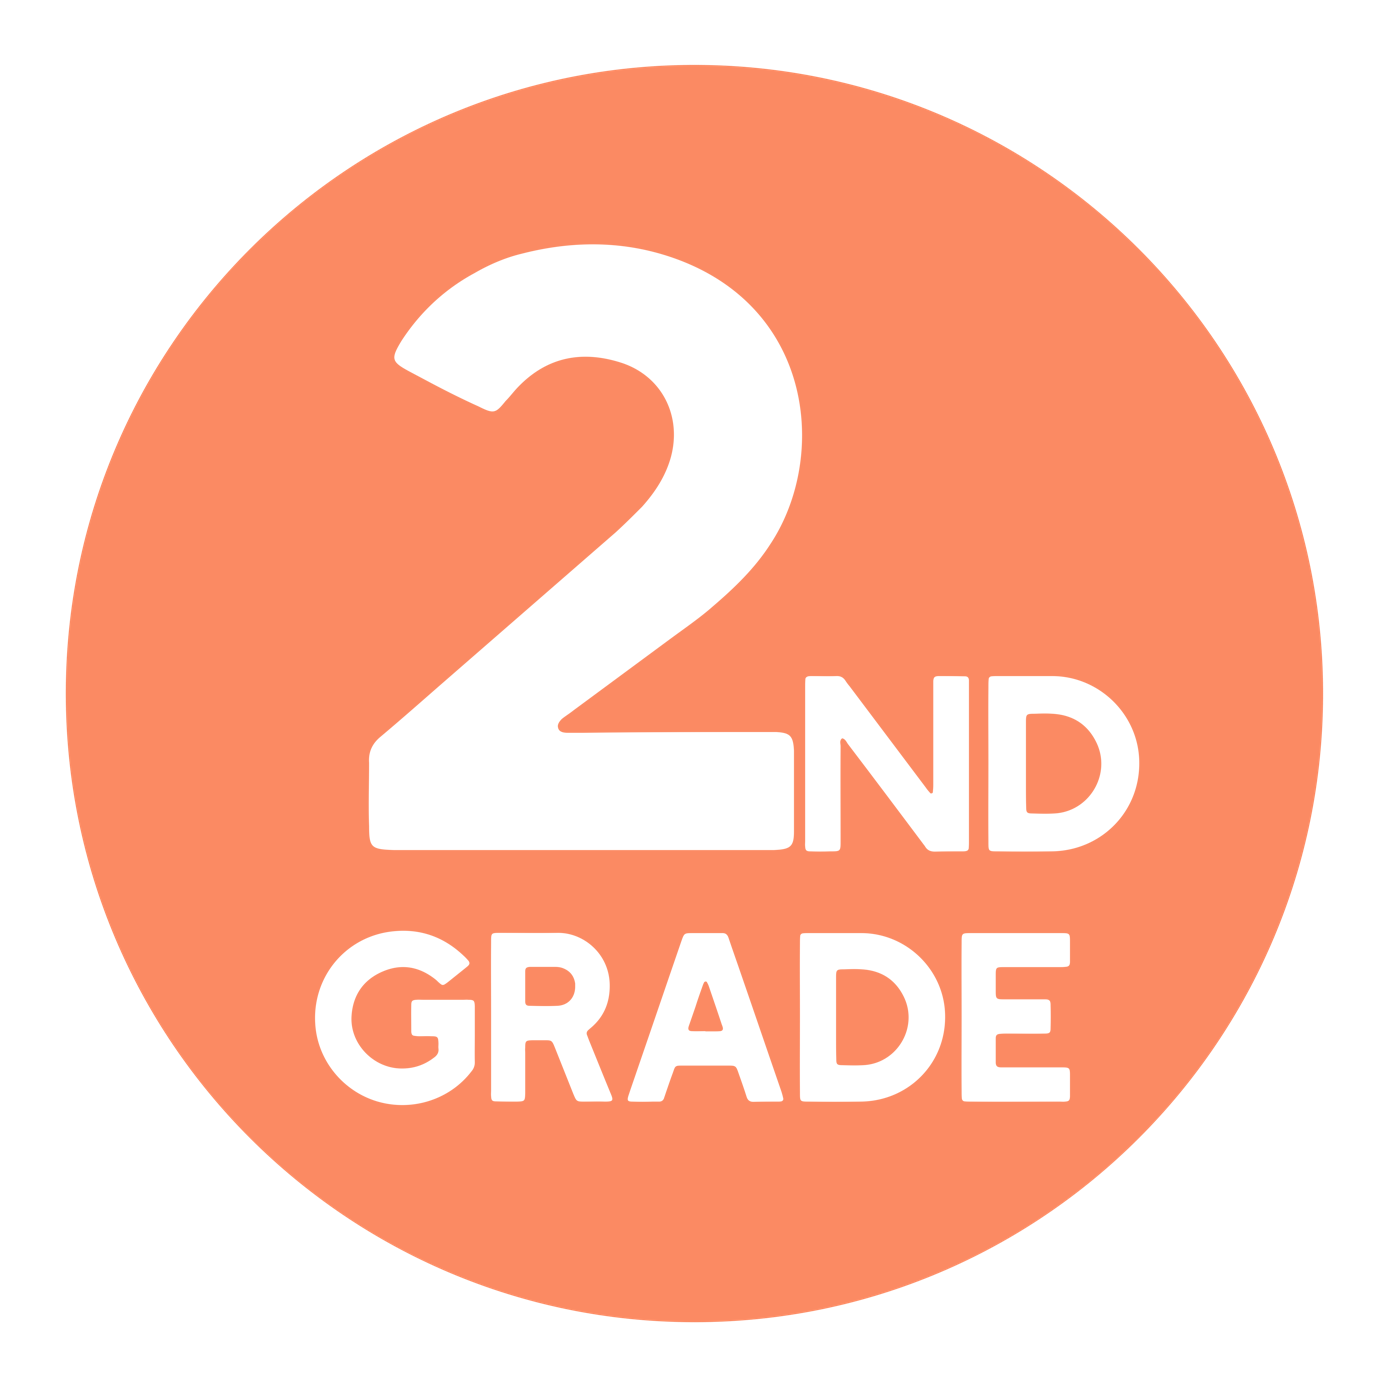 Free 2nd Grade Math Worksheets Mashup Math Free Math Worksheets 2nd Grade Math Worksheets Math Worksheets